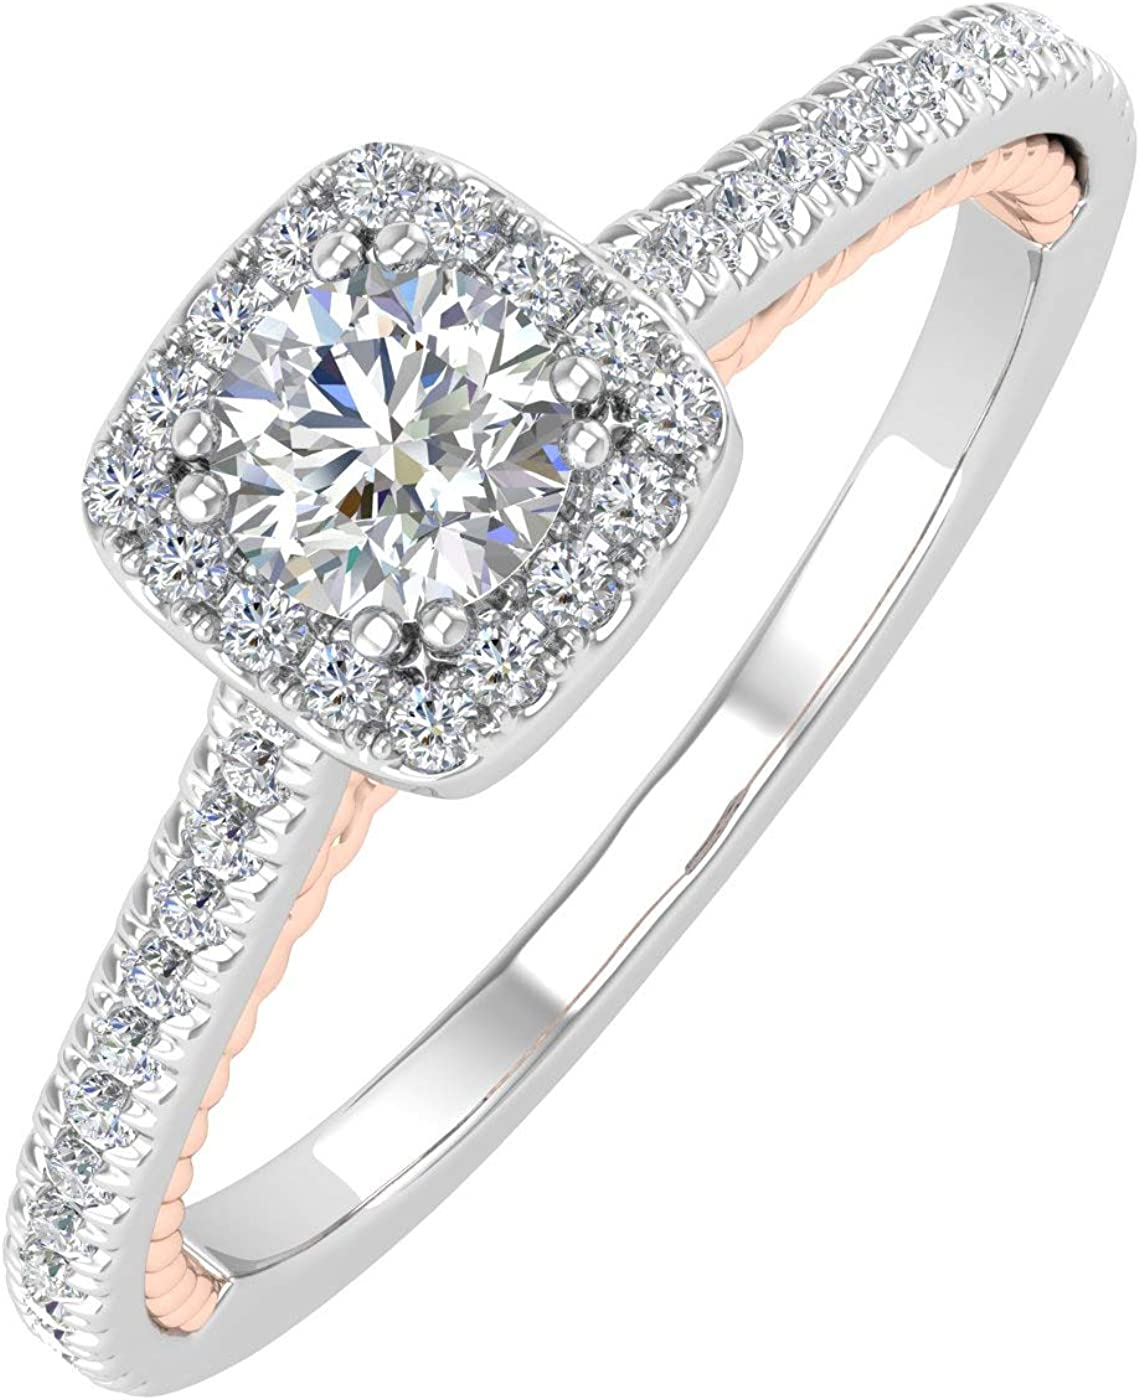 1/2 Carat Diamond Cushion Shape Halo Engagement Ring in 10K Gold - IGI Certified